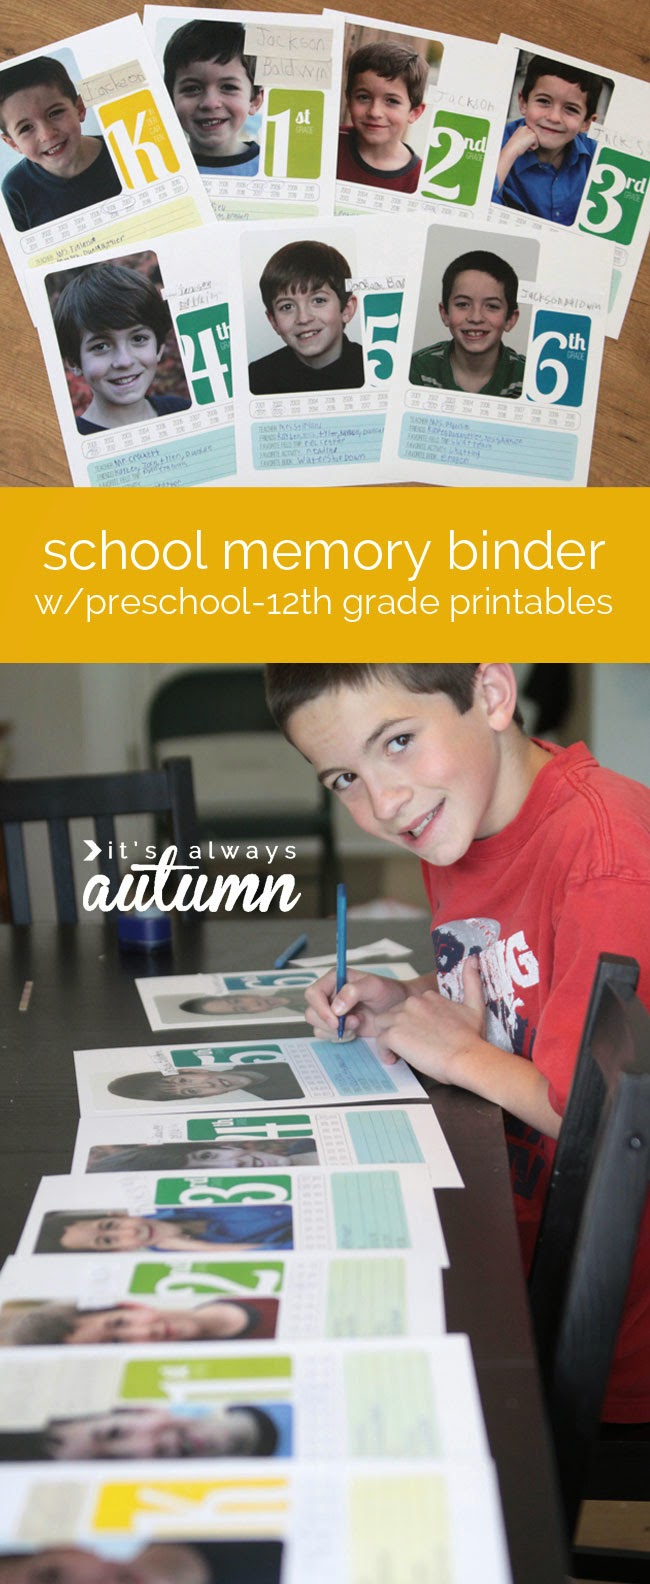 http://www.itsalwaysautumn.com/2014/04/18/get-organized-school-memory-binder.html